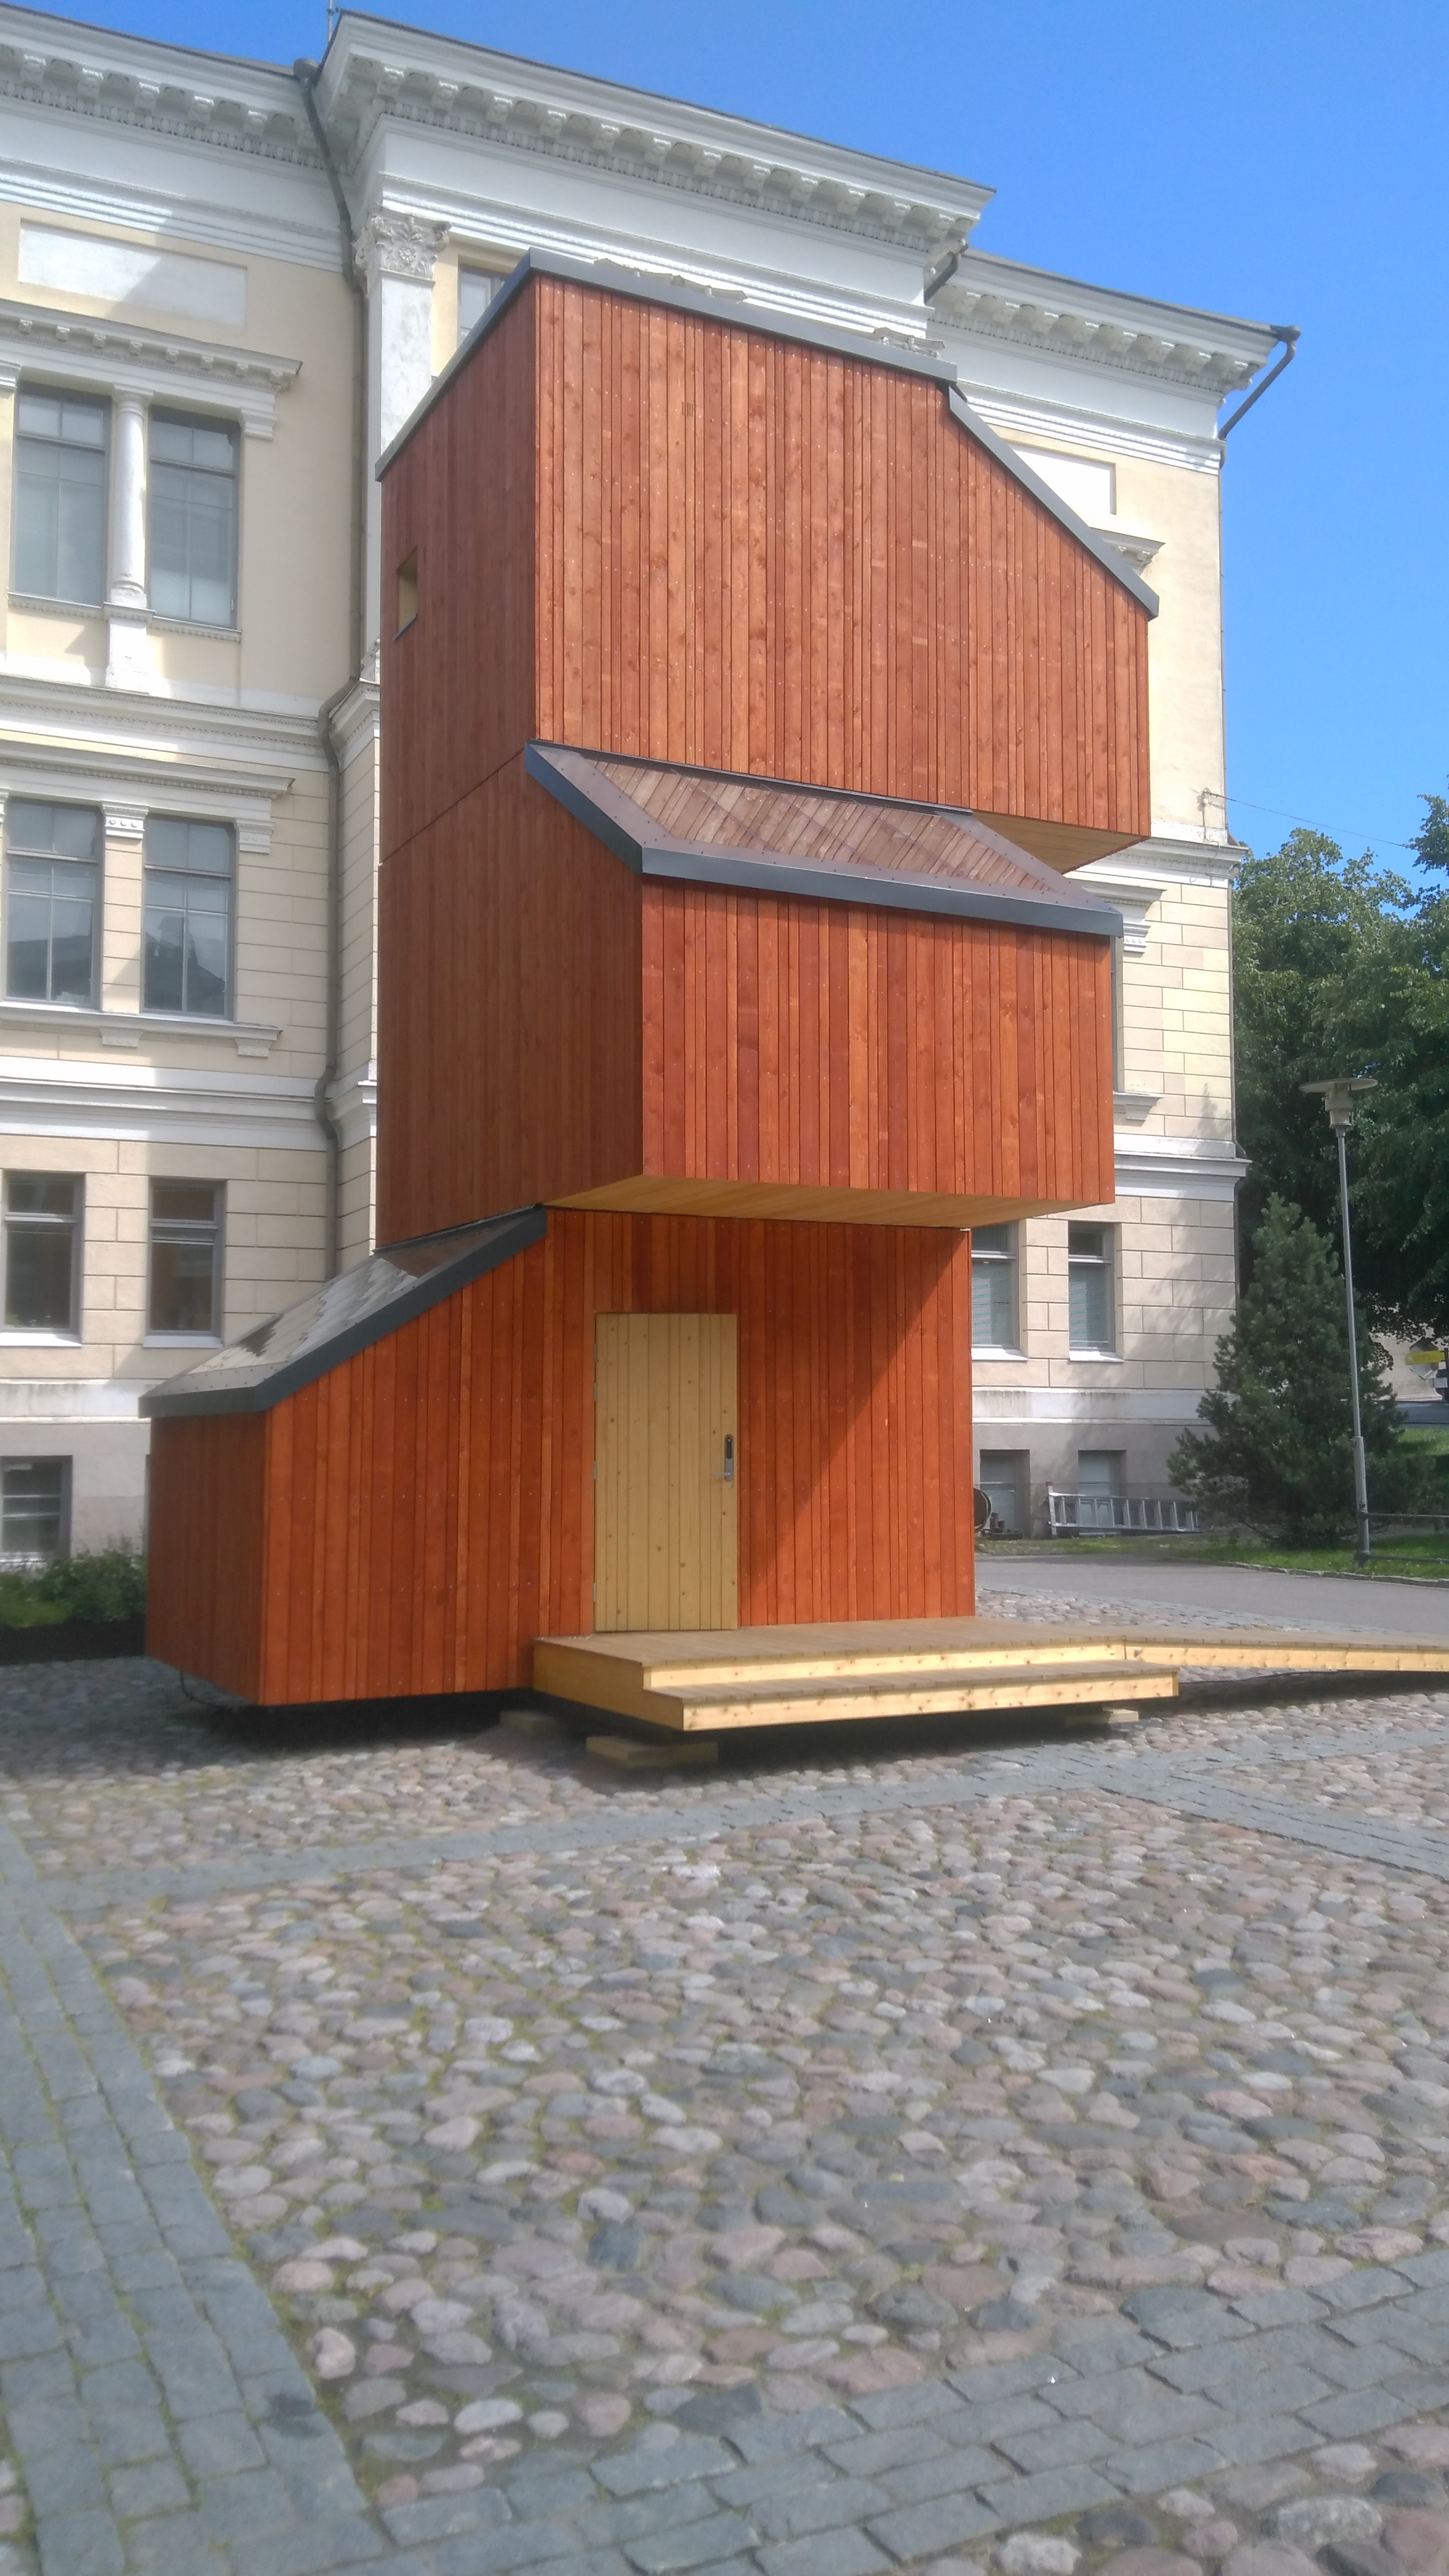 Wood studio pavilion, Museum of Finnish Architecture, Helsinki. By TTKK via  Wikimedia Commons